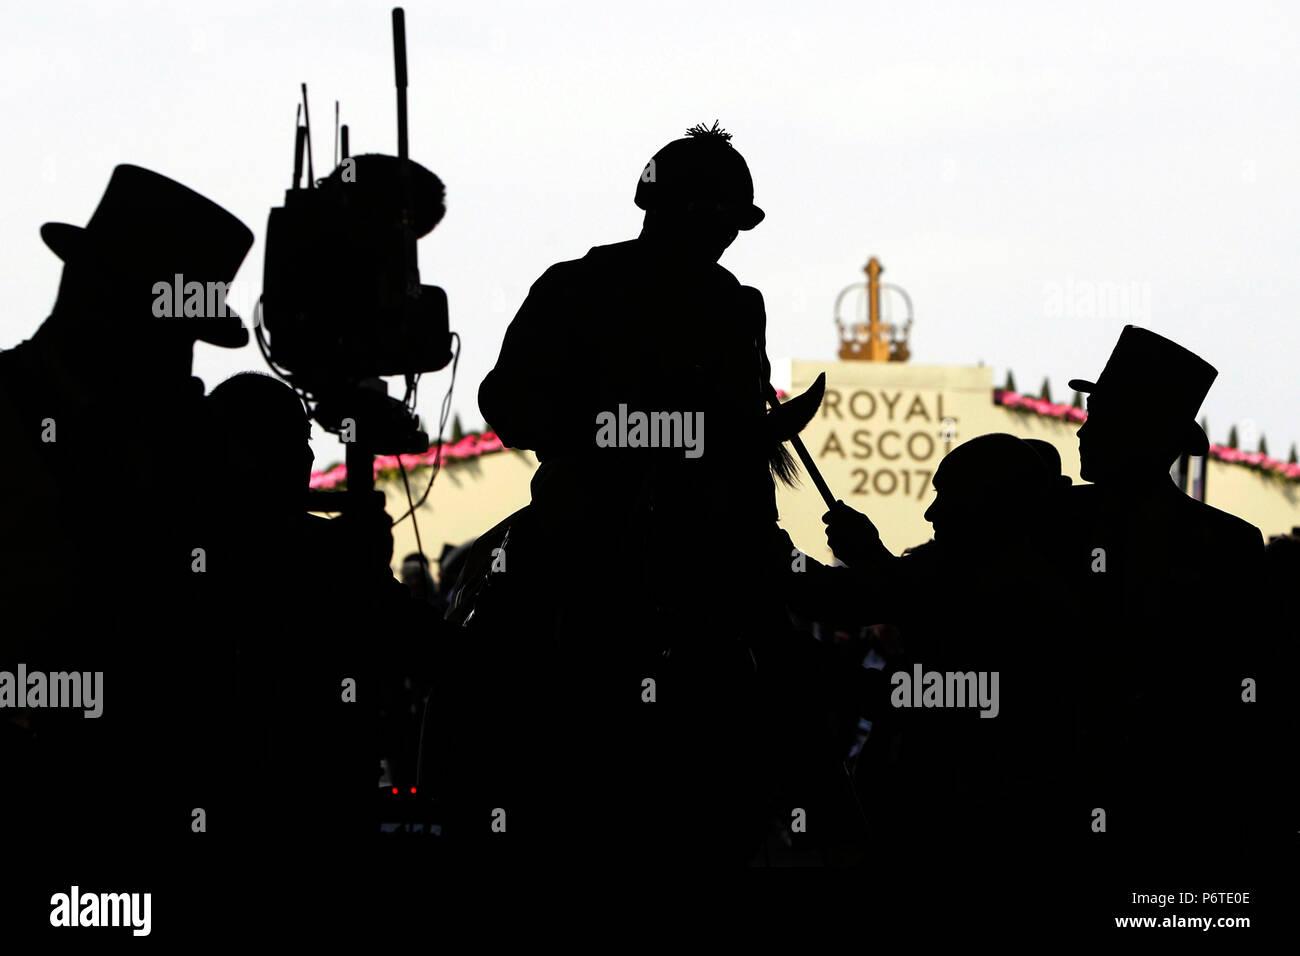 Royal Ascot, Symbolic picture, Royal Ascot 2017 - Stock Image